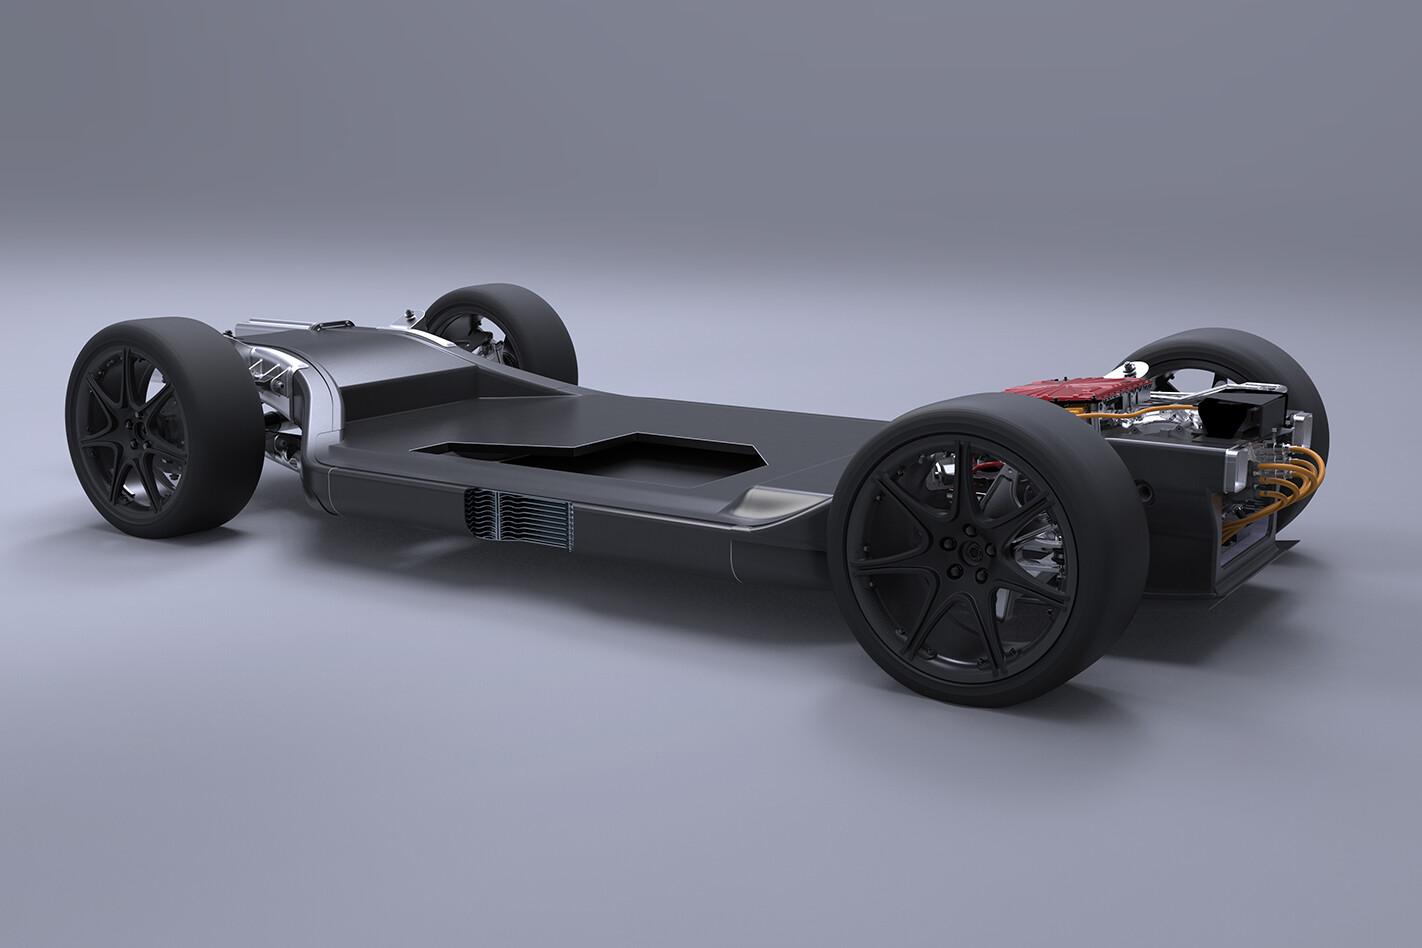 Williams electric supercar platform